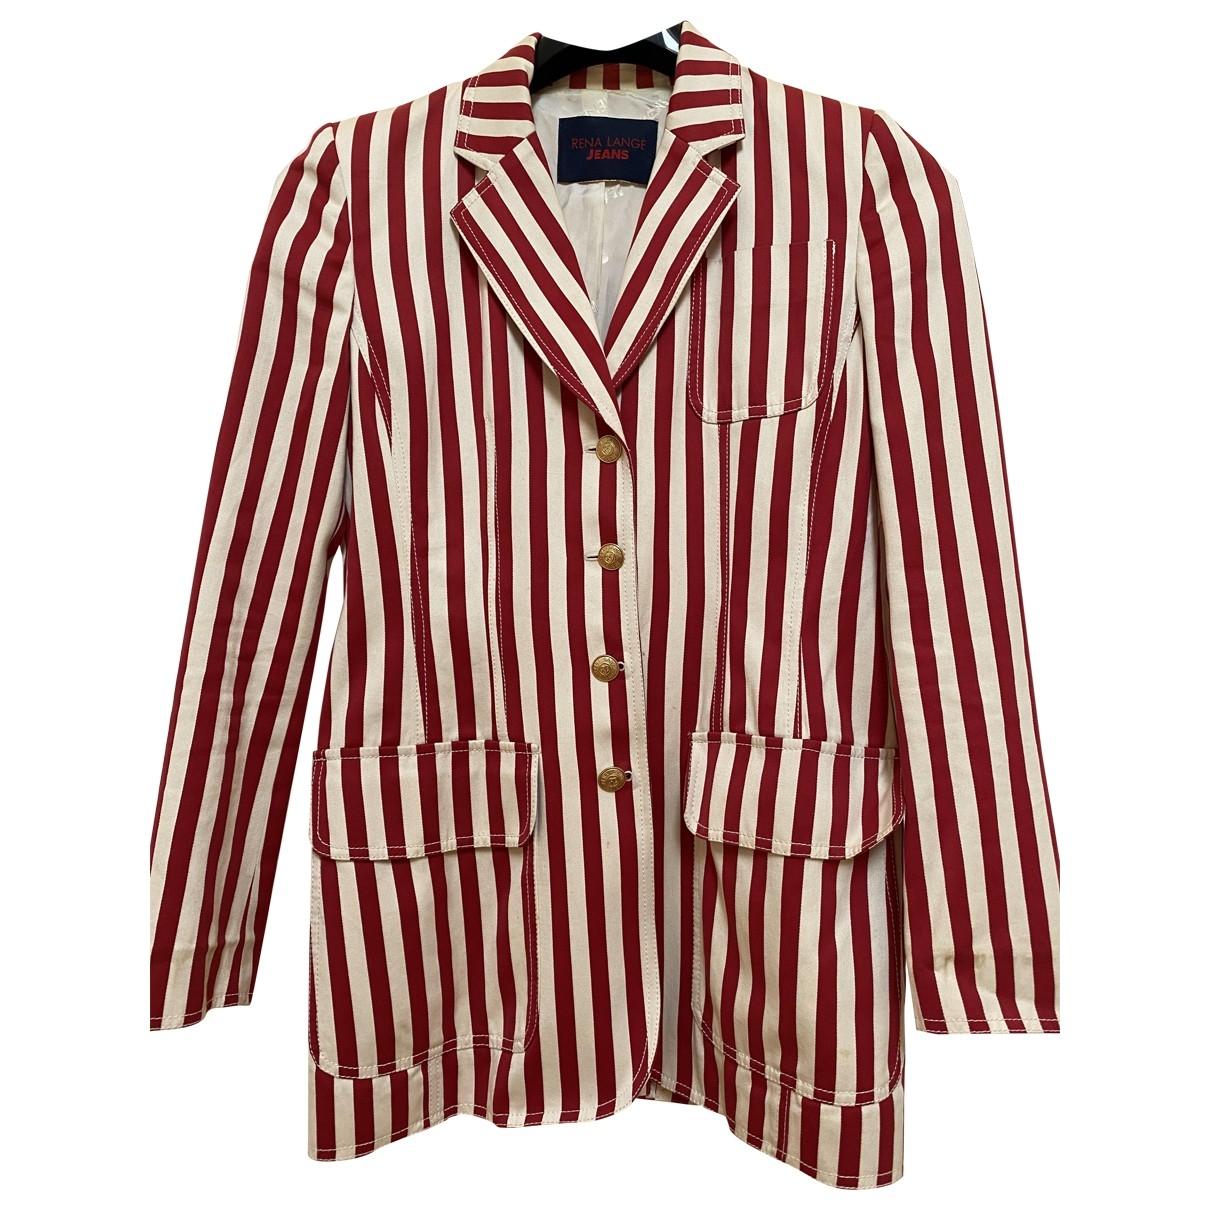 Rena Lange \N Jacke in  Rot Polyester